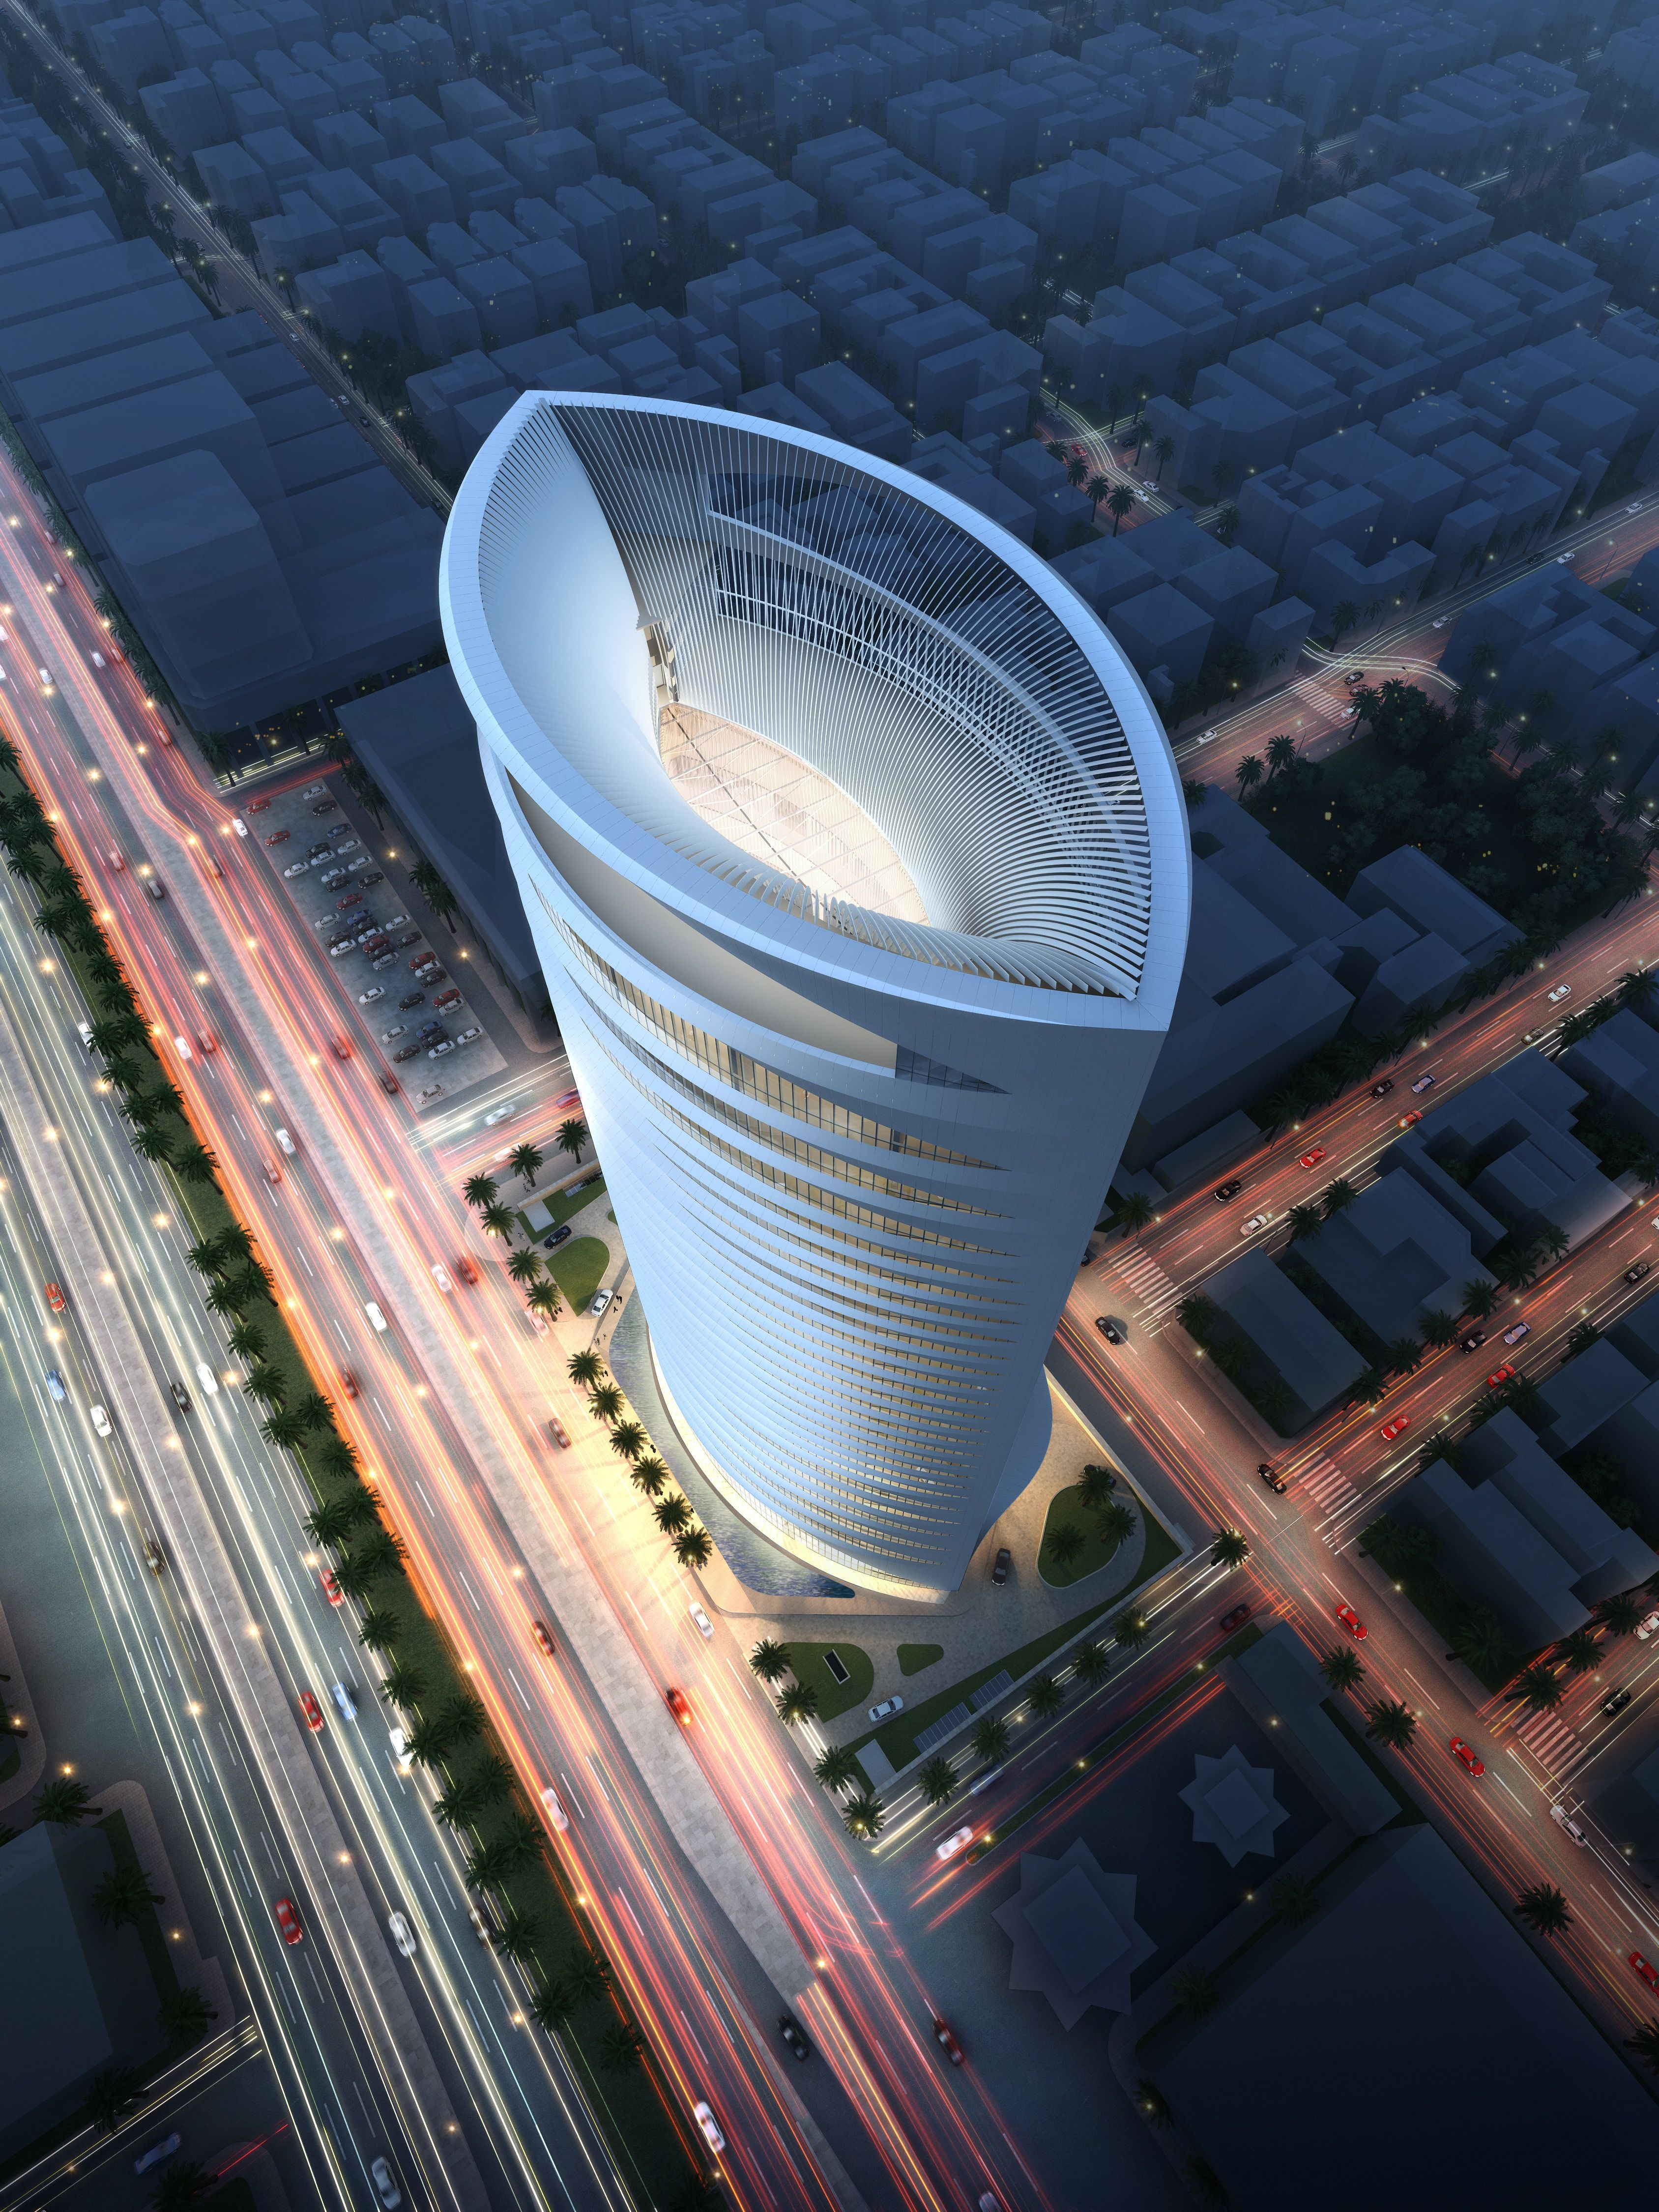 Park Hyatt Designed By Skidmore Owings Merrill C Som Crystal Cg Riyadh Saudiarabia Foto De Instagram Instagram Fotos